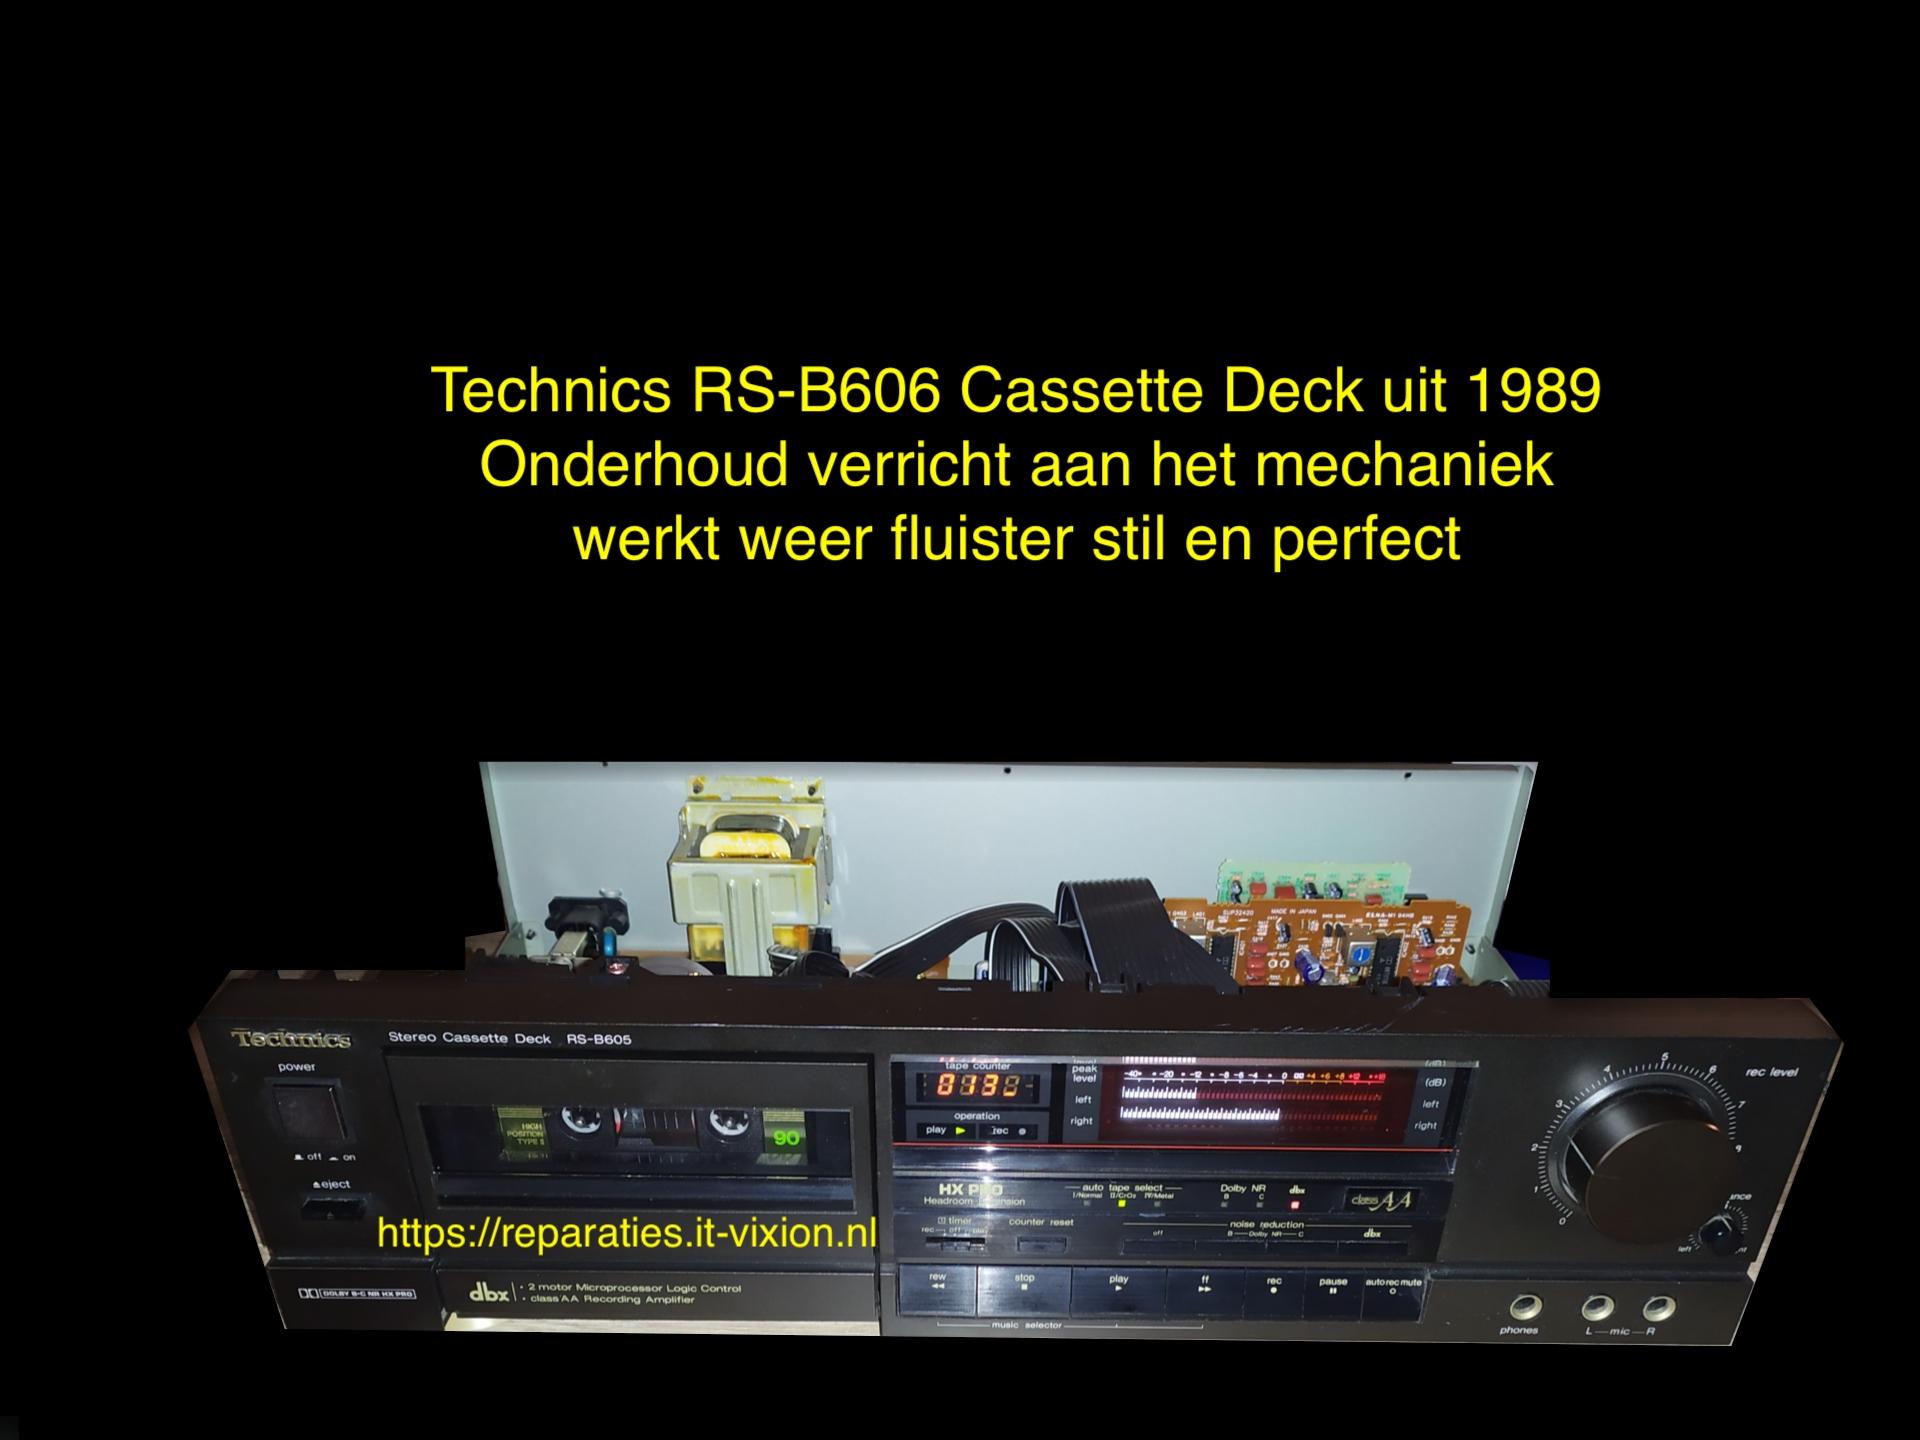 Technics RS-B606 Cassette Deck